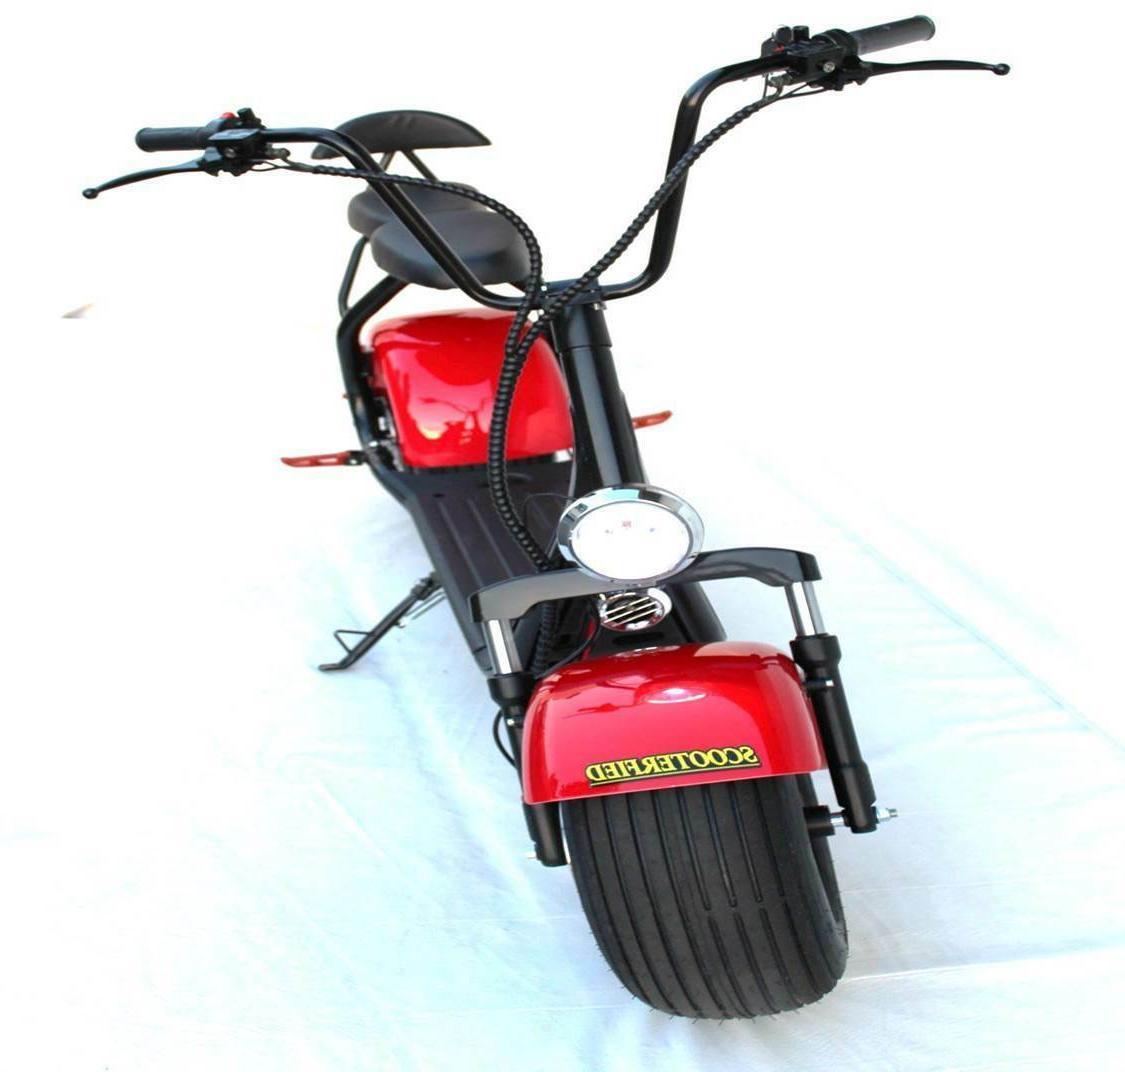 2 2000w Scooter 18.5 Fat Scooterfied.com Chopper Bike